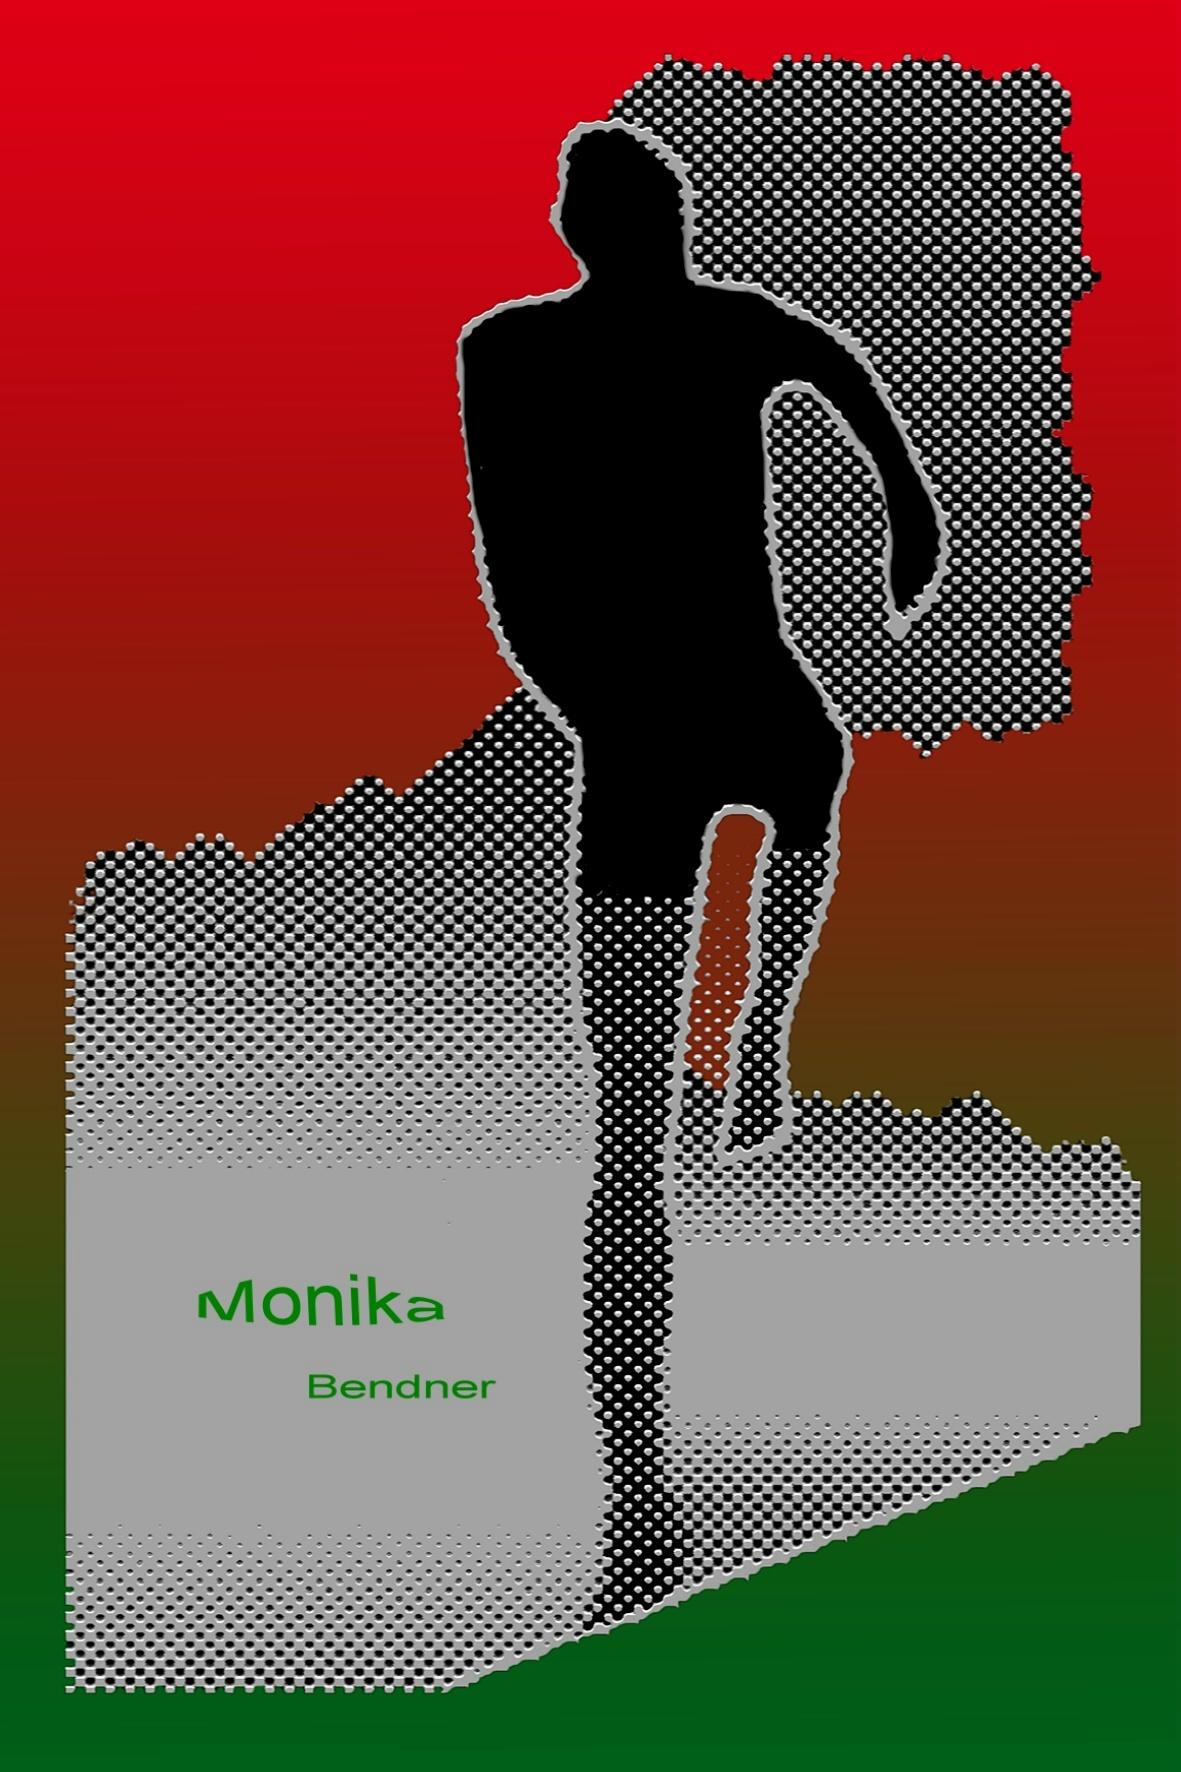 bendner-monika-The athlete